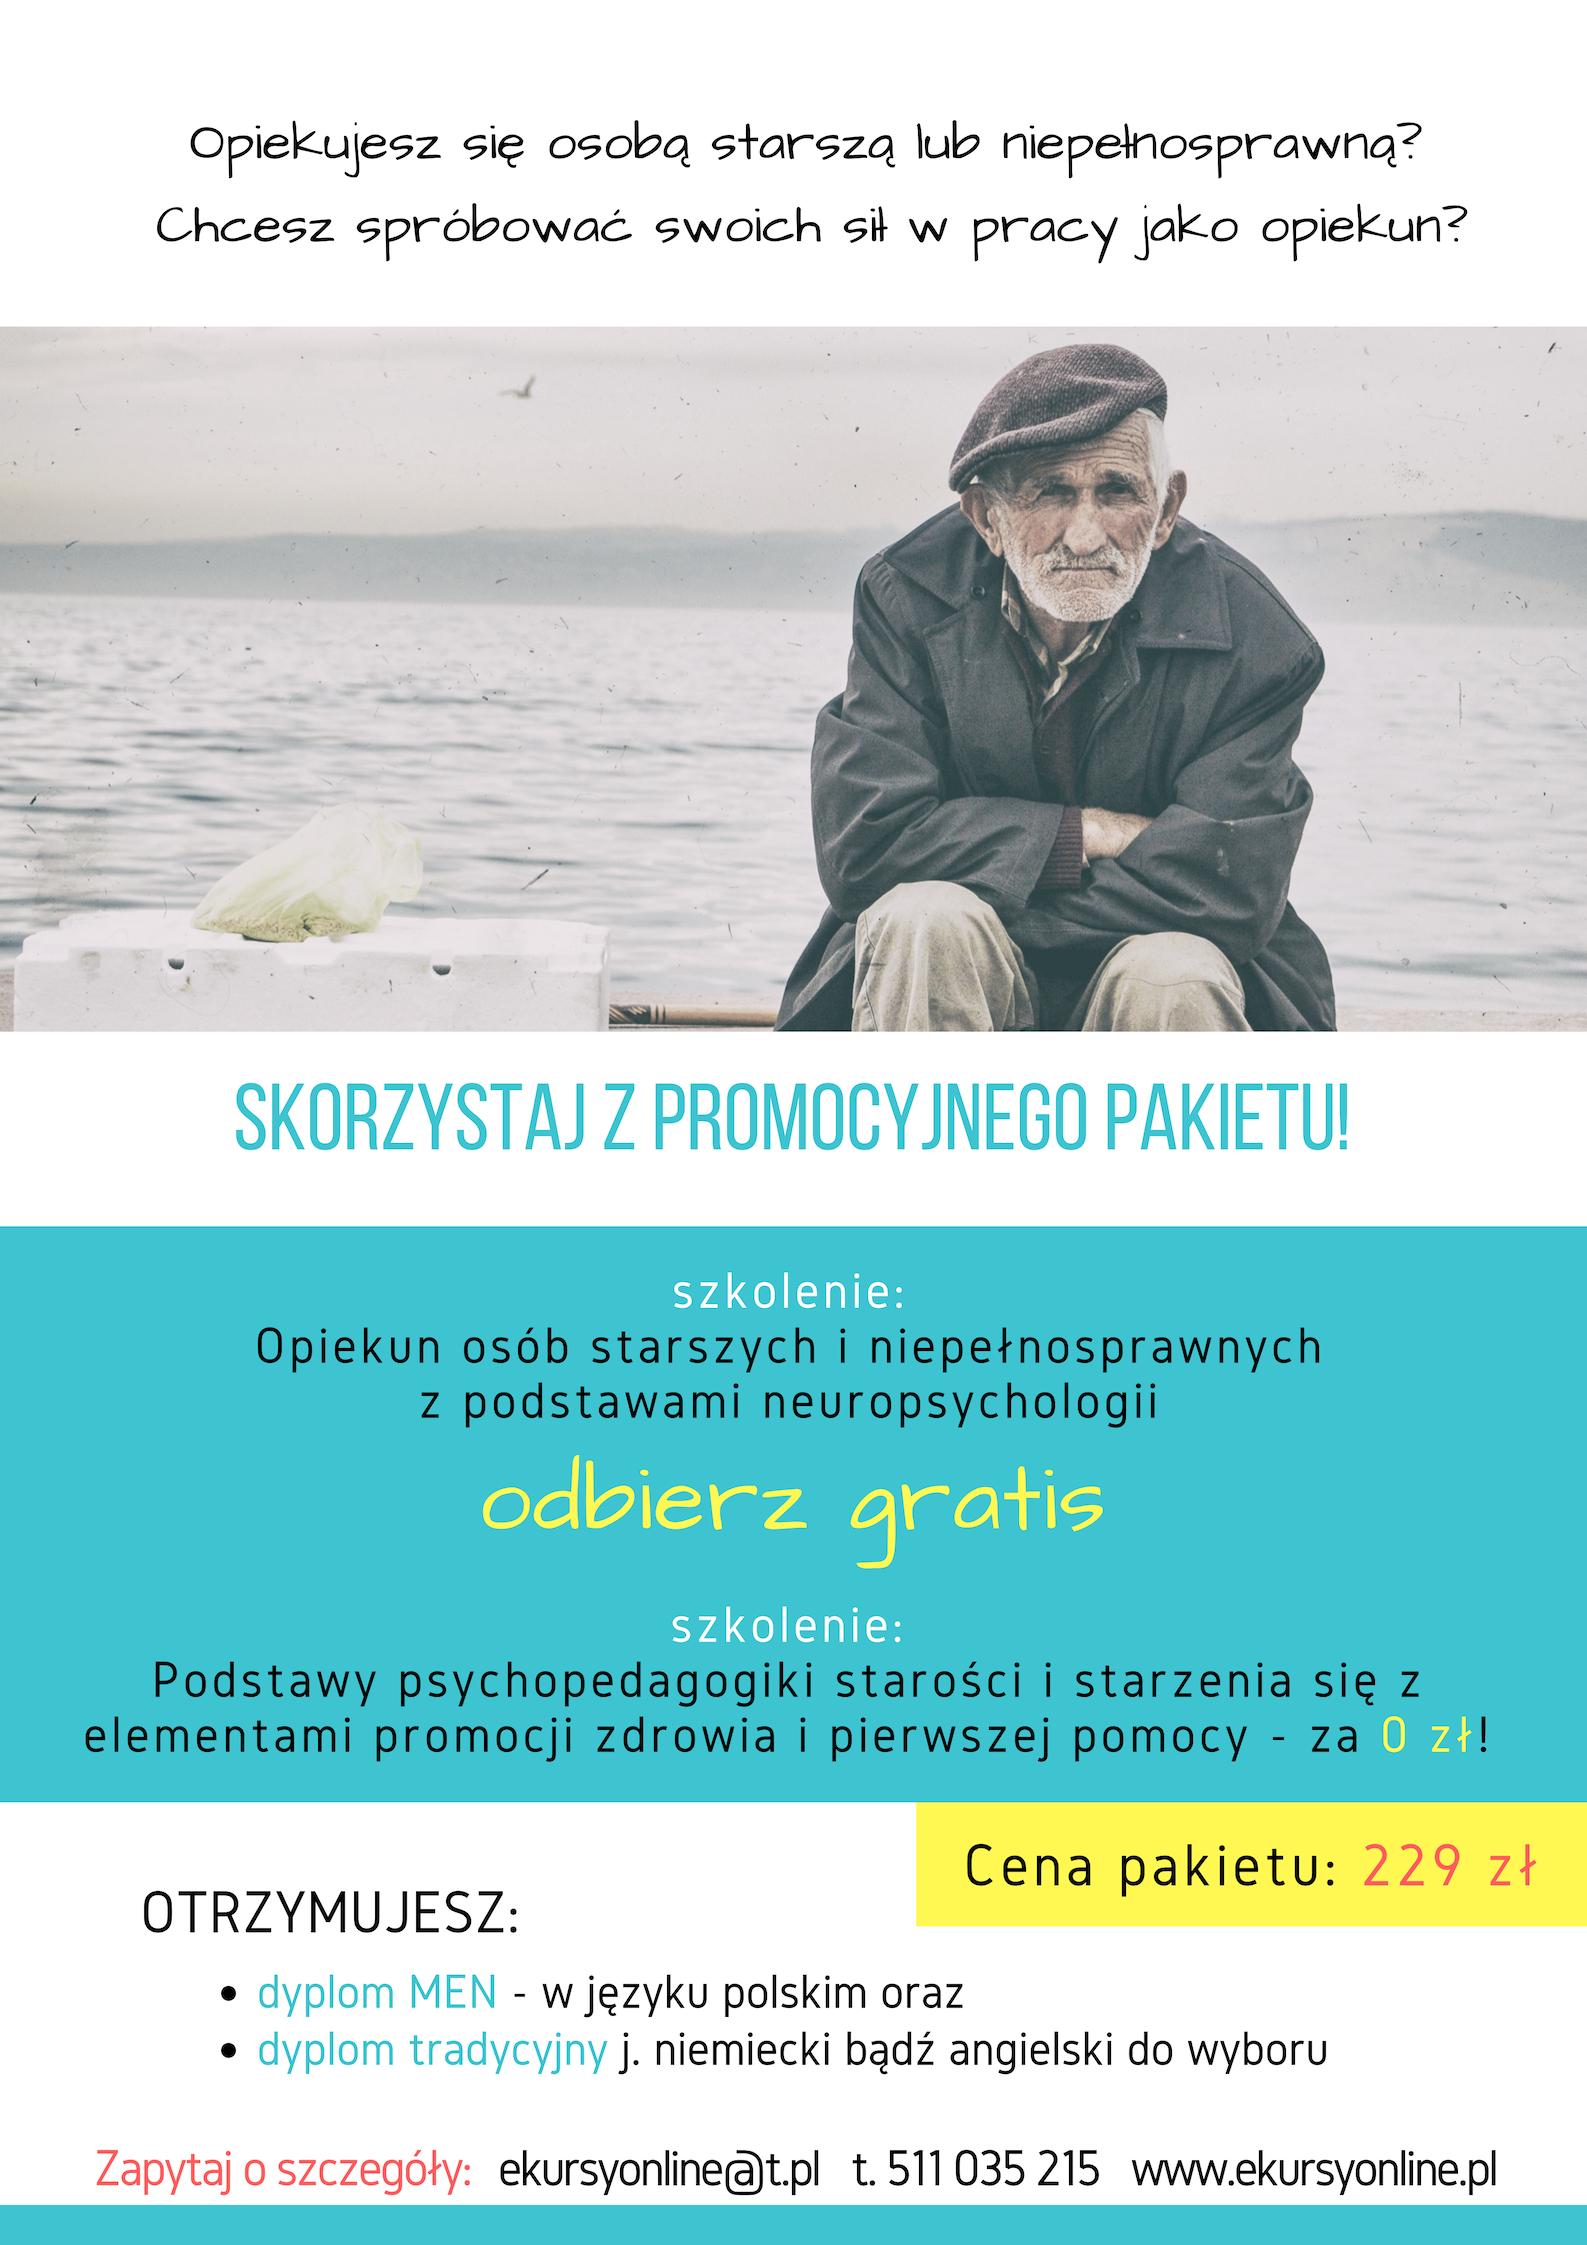 Promocja Pakiet Opiekun